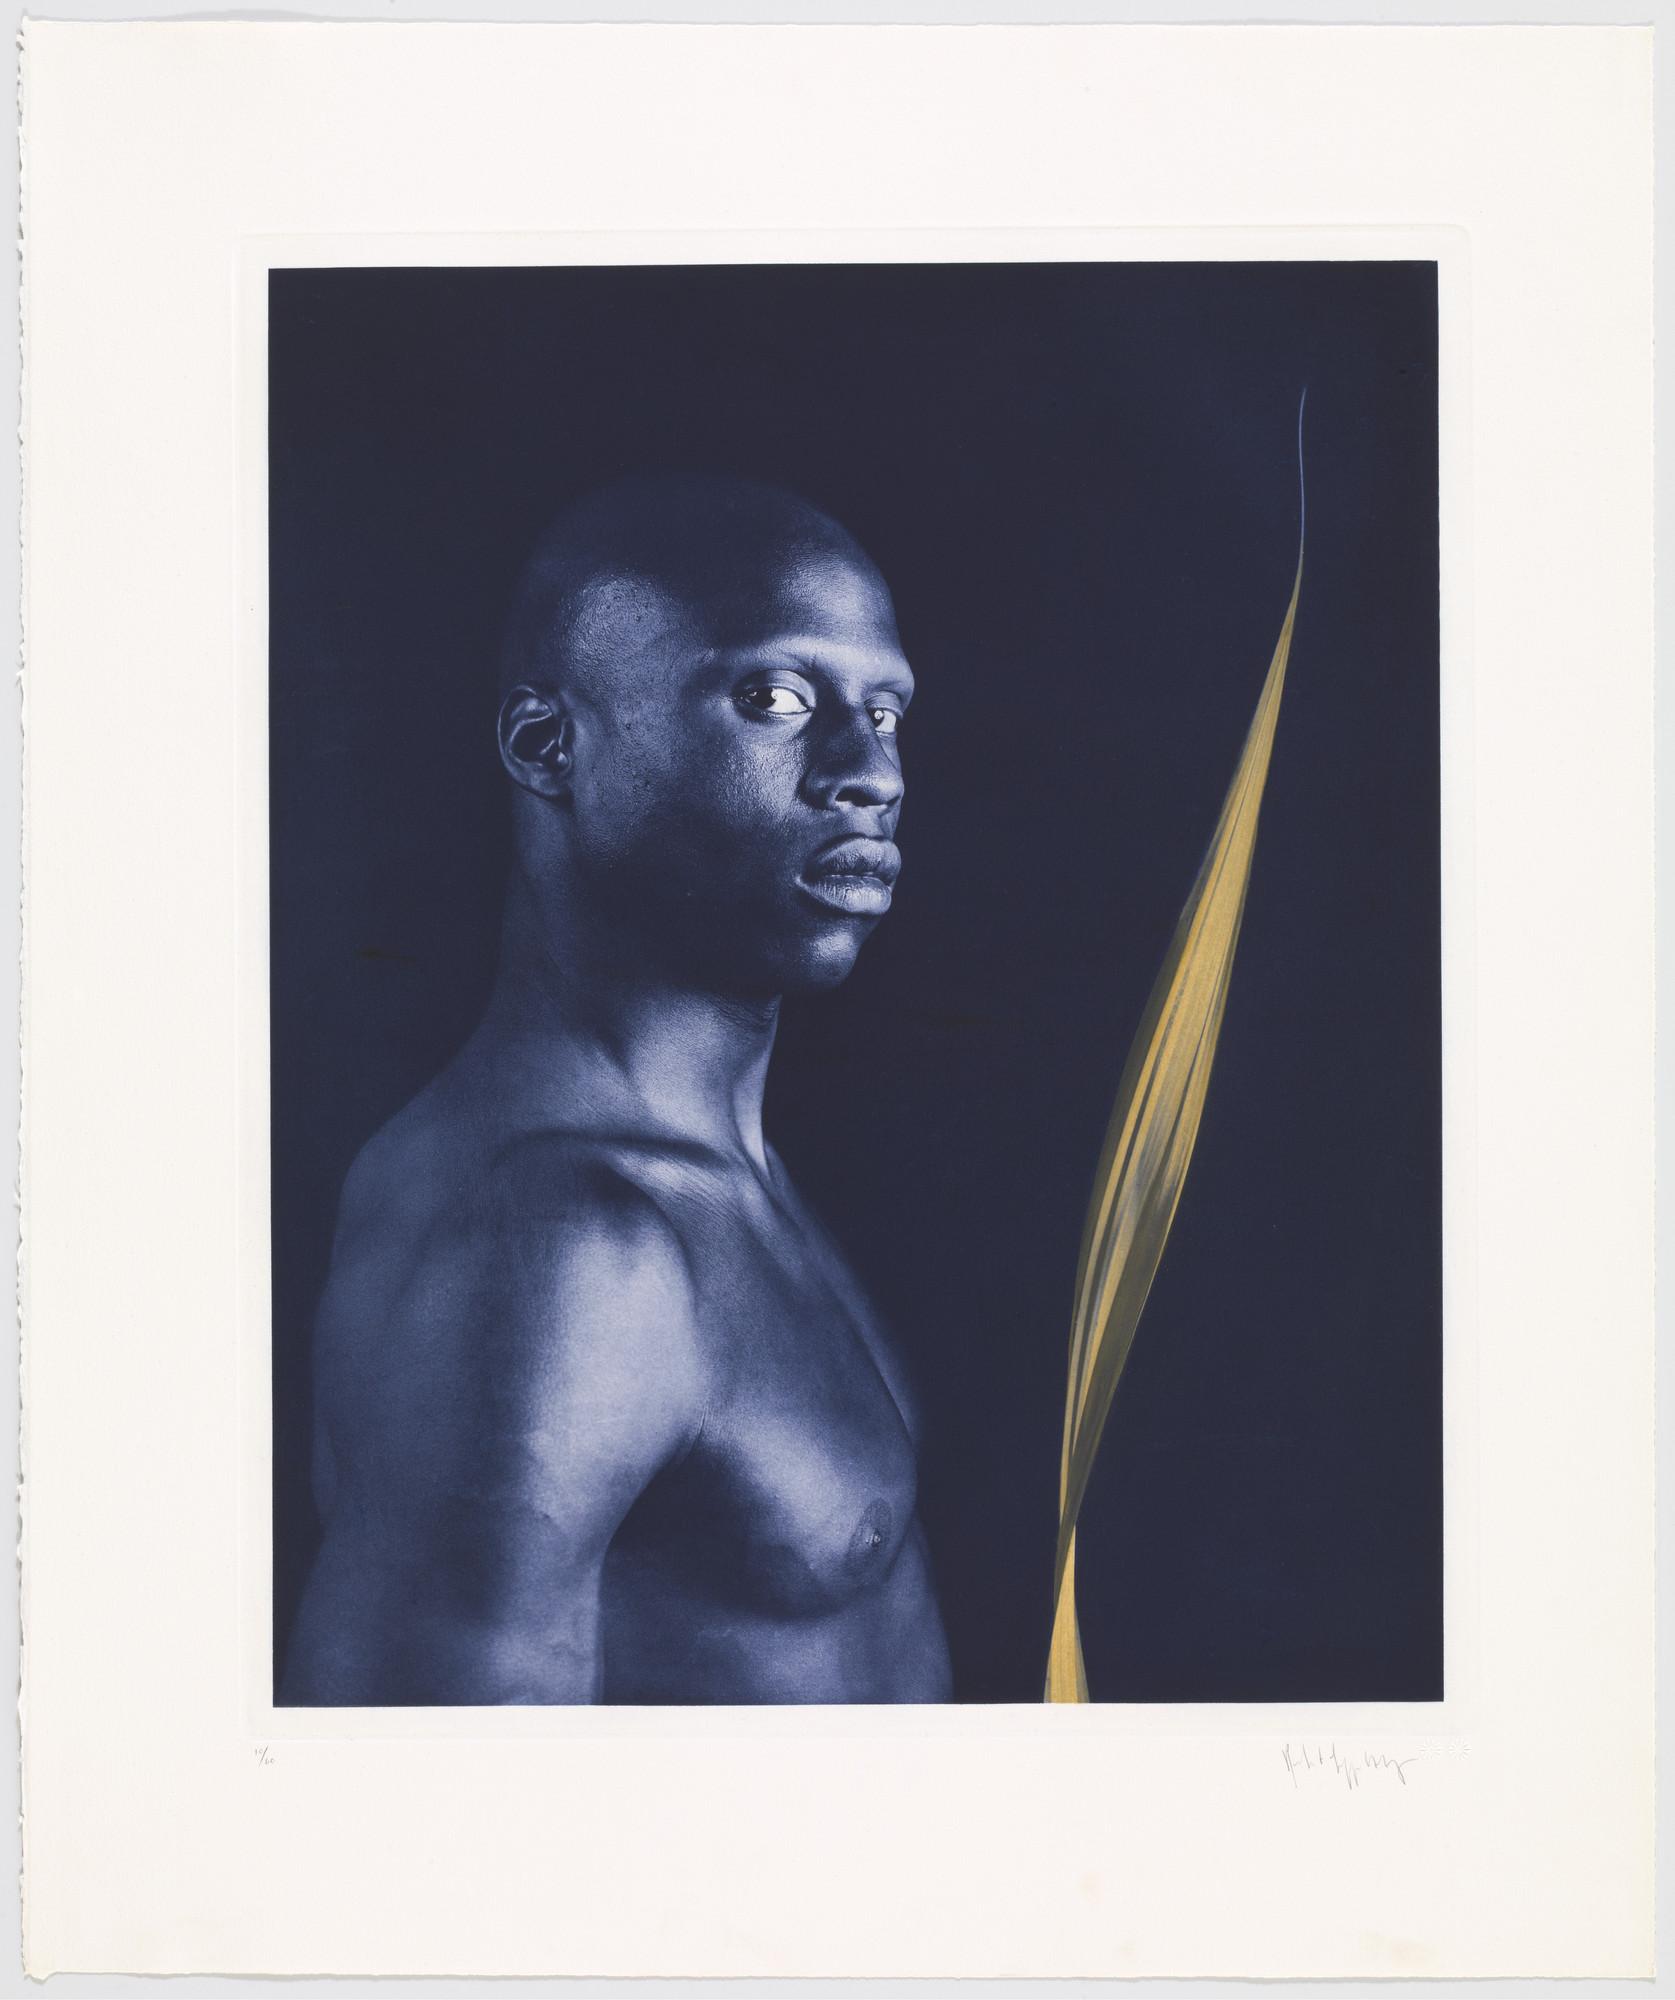 Robert Mapplethorpe. Untitled from the Ken Moody Portfolio. 1985 | MoMA